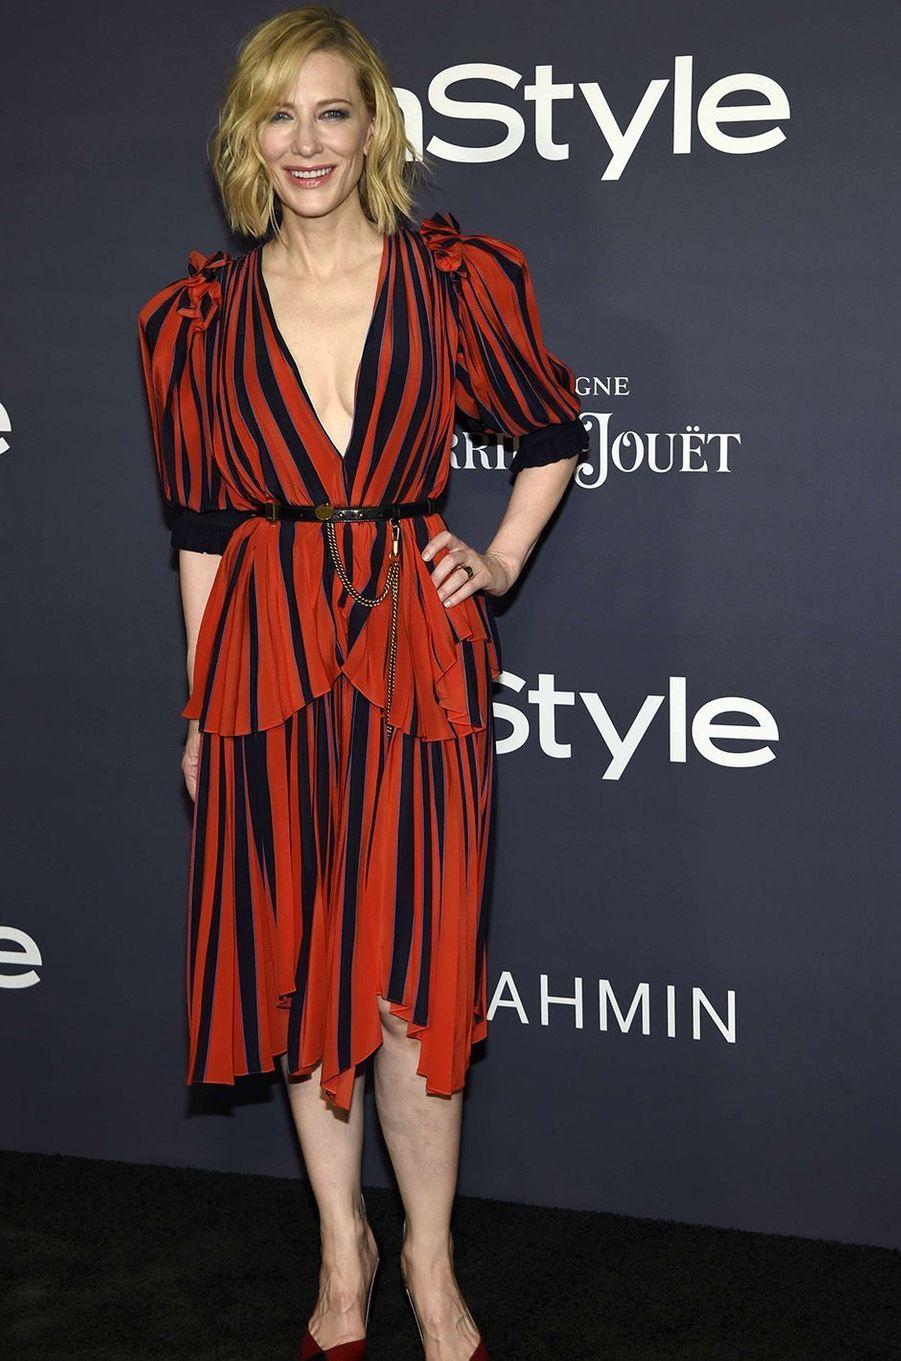 Cate Blanchett lors des InStyle Awards, à Los Angeles, le 23 octobre 2017.